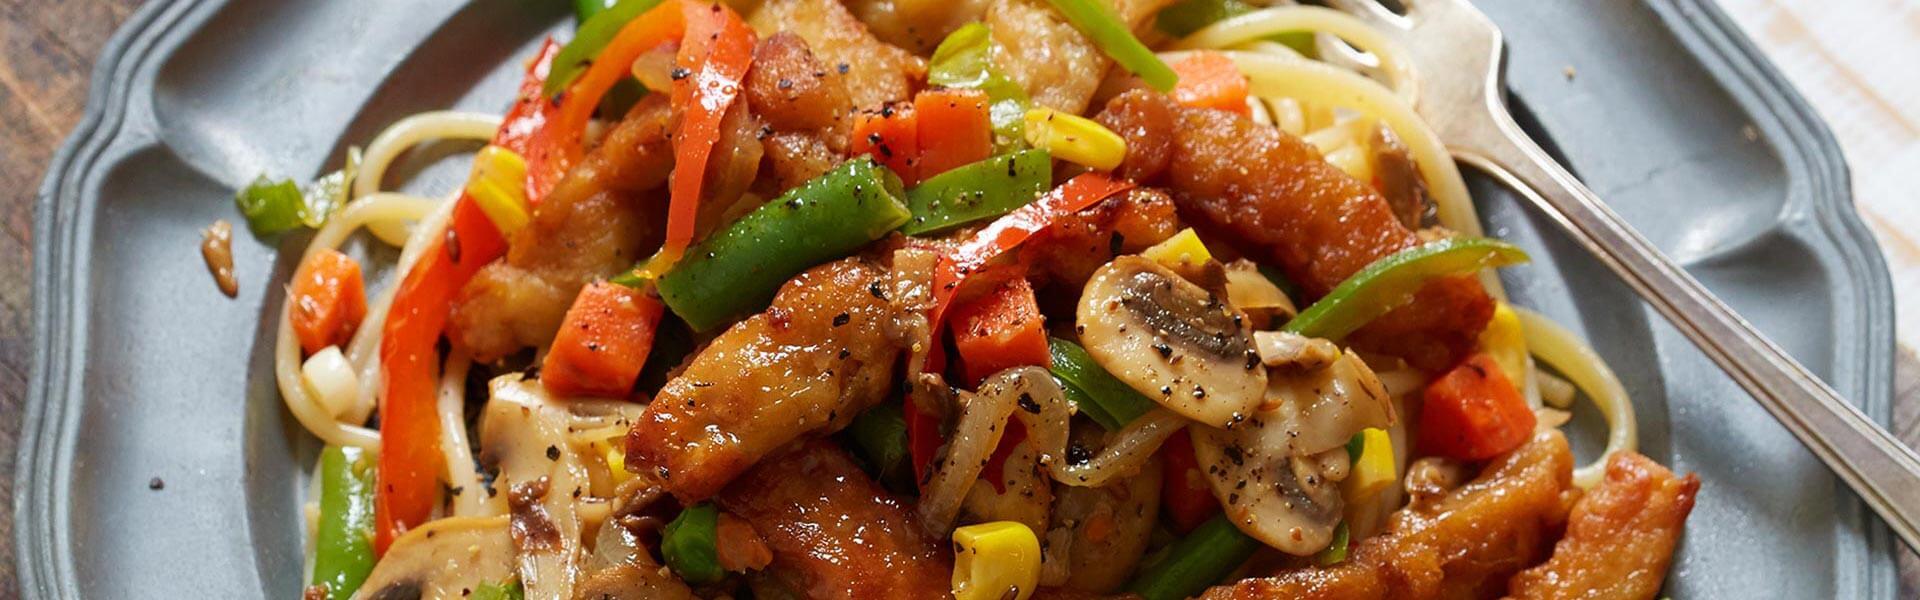 chicken style veg pasta